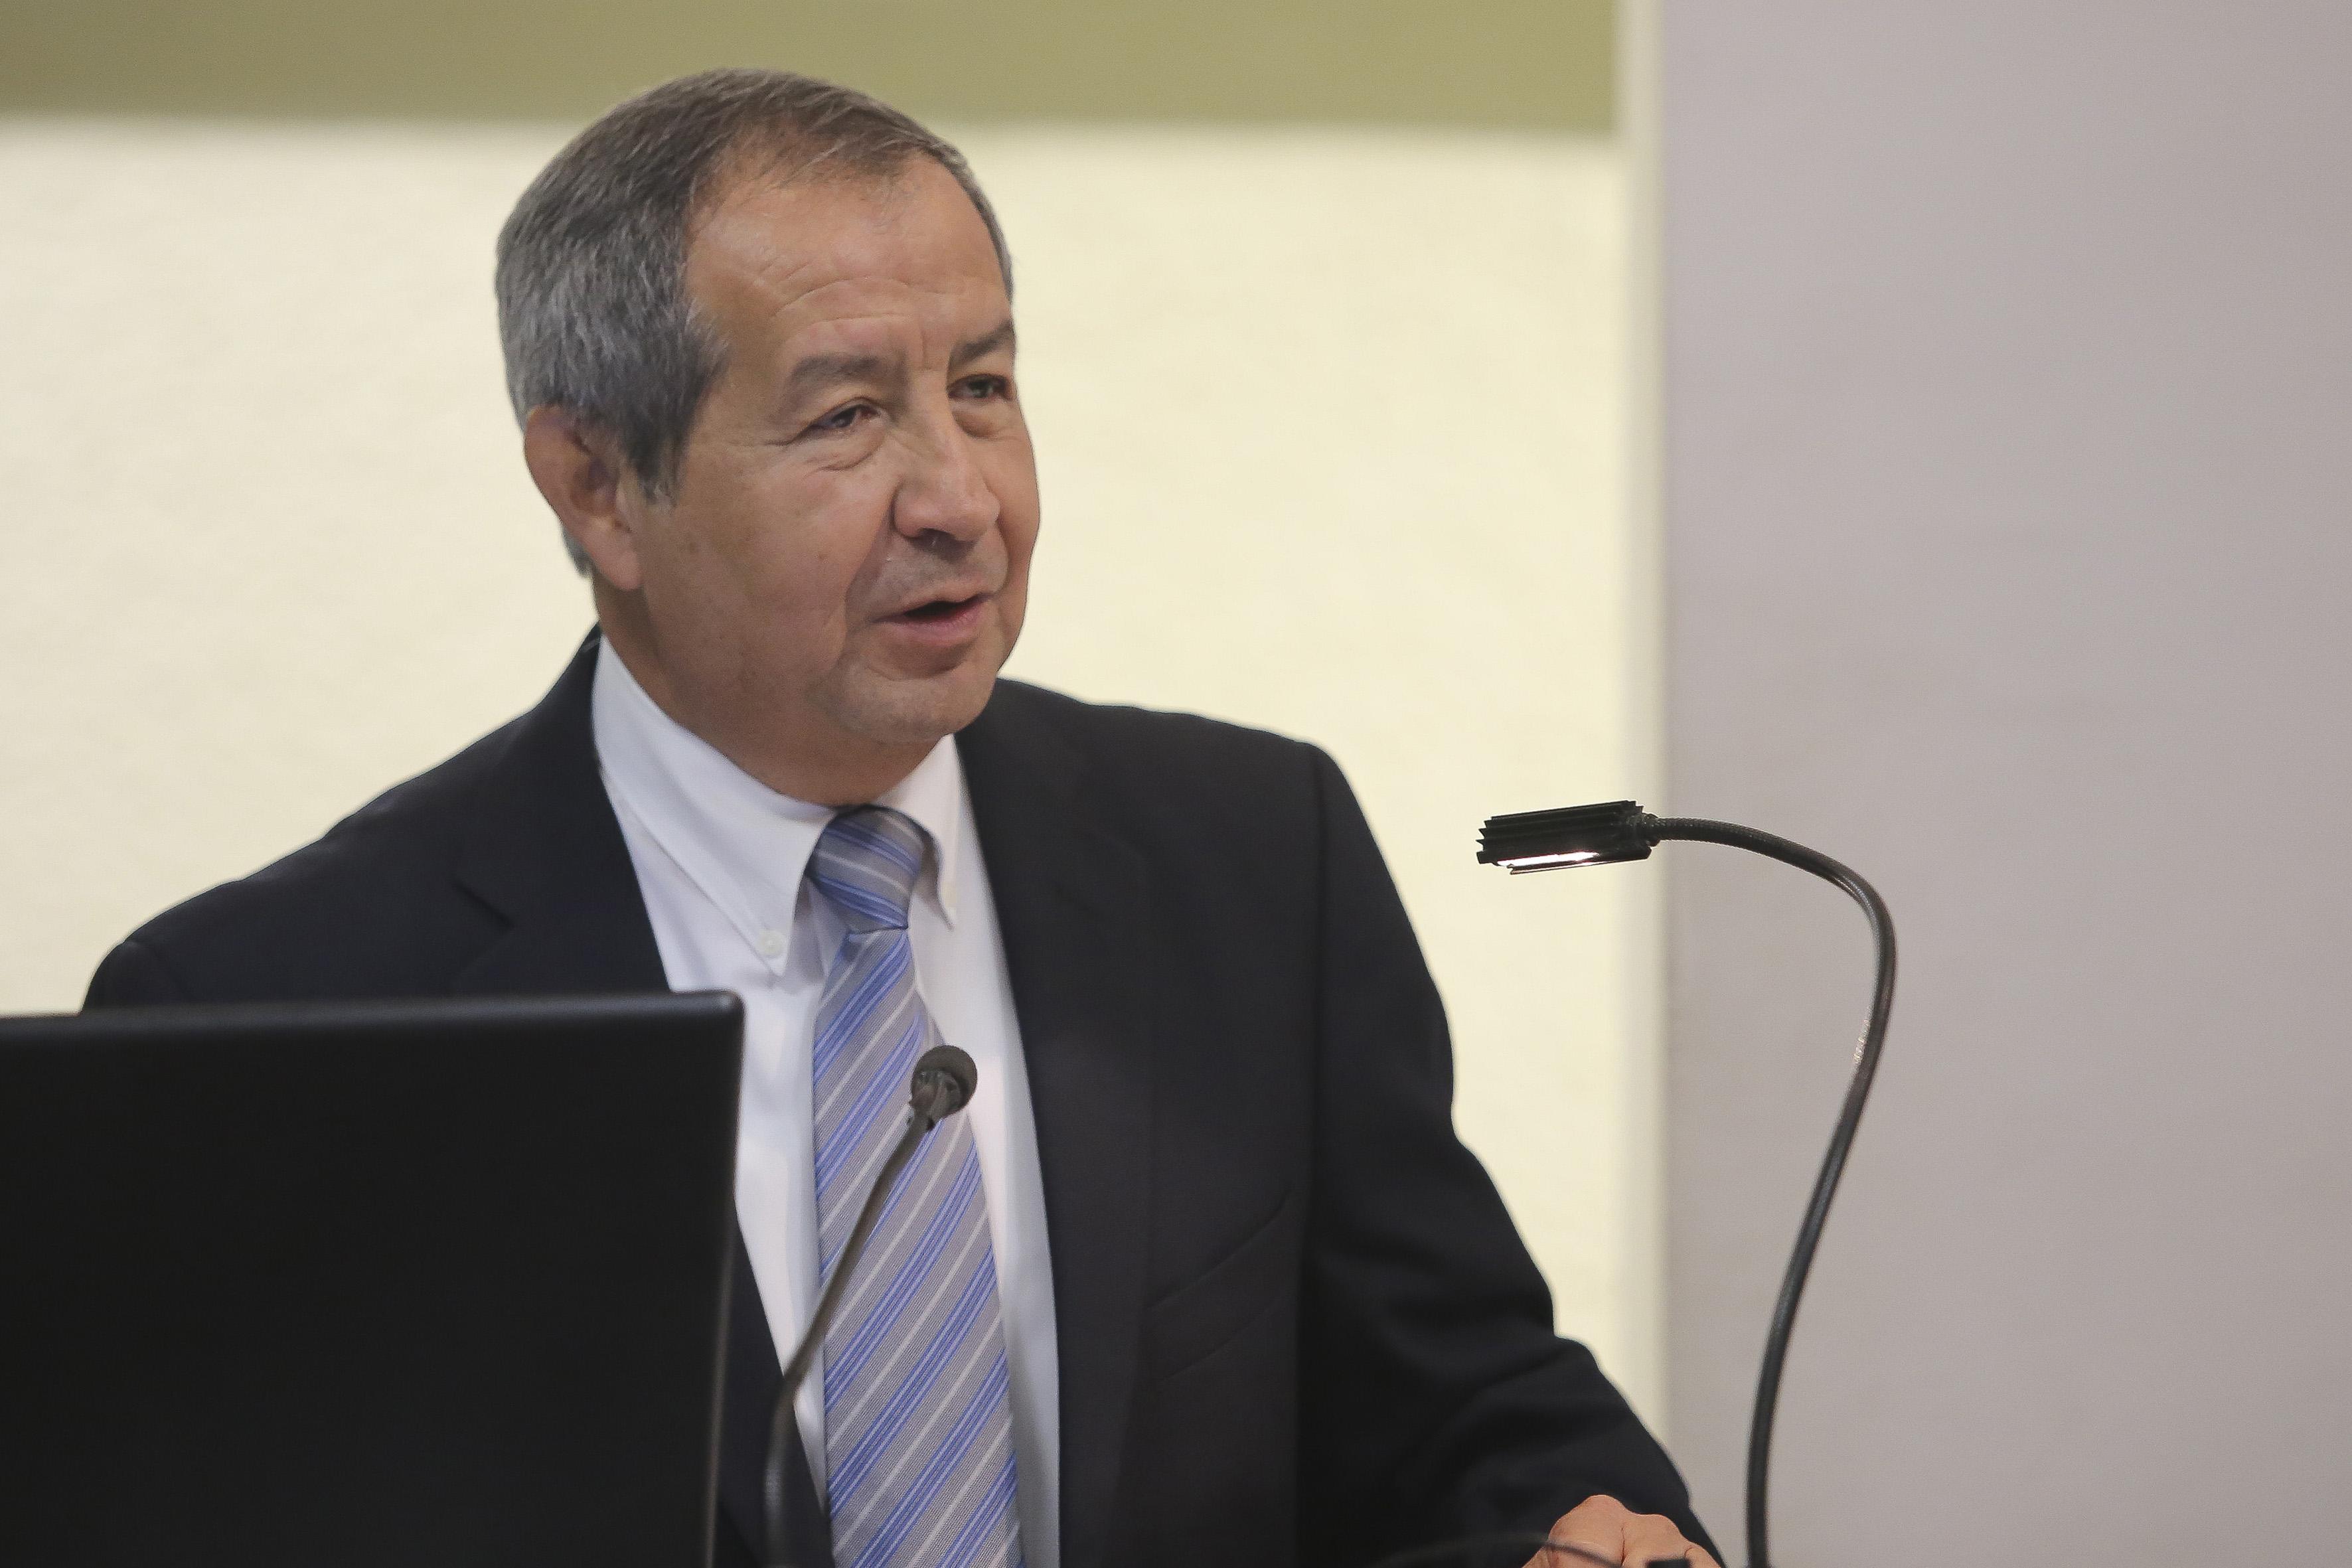 Dr. Lorenzo Hernández Quiroz ofreciendo discurso